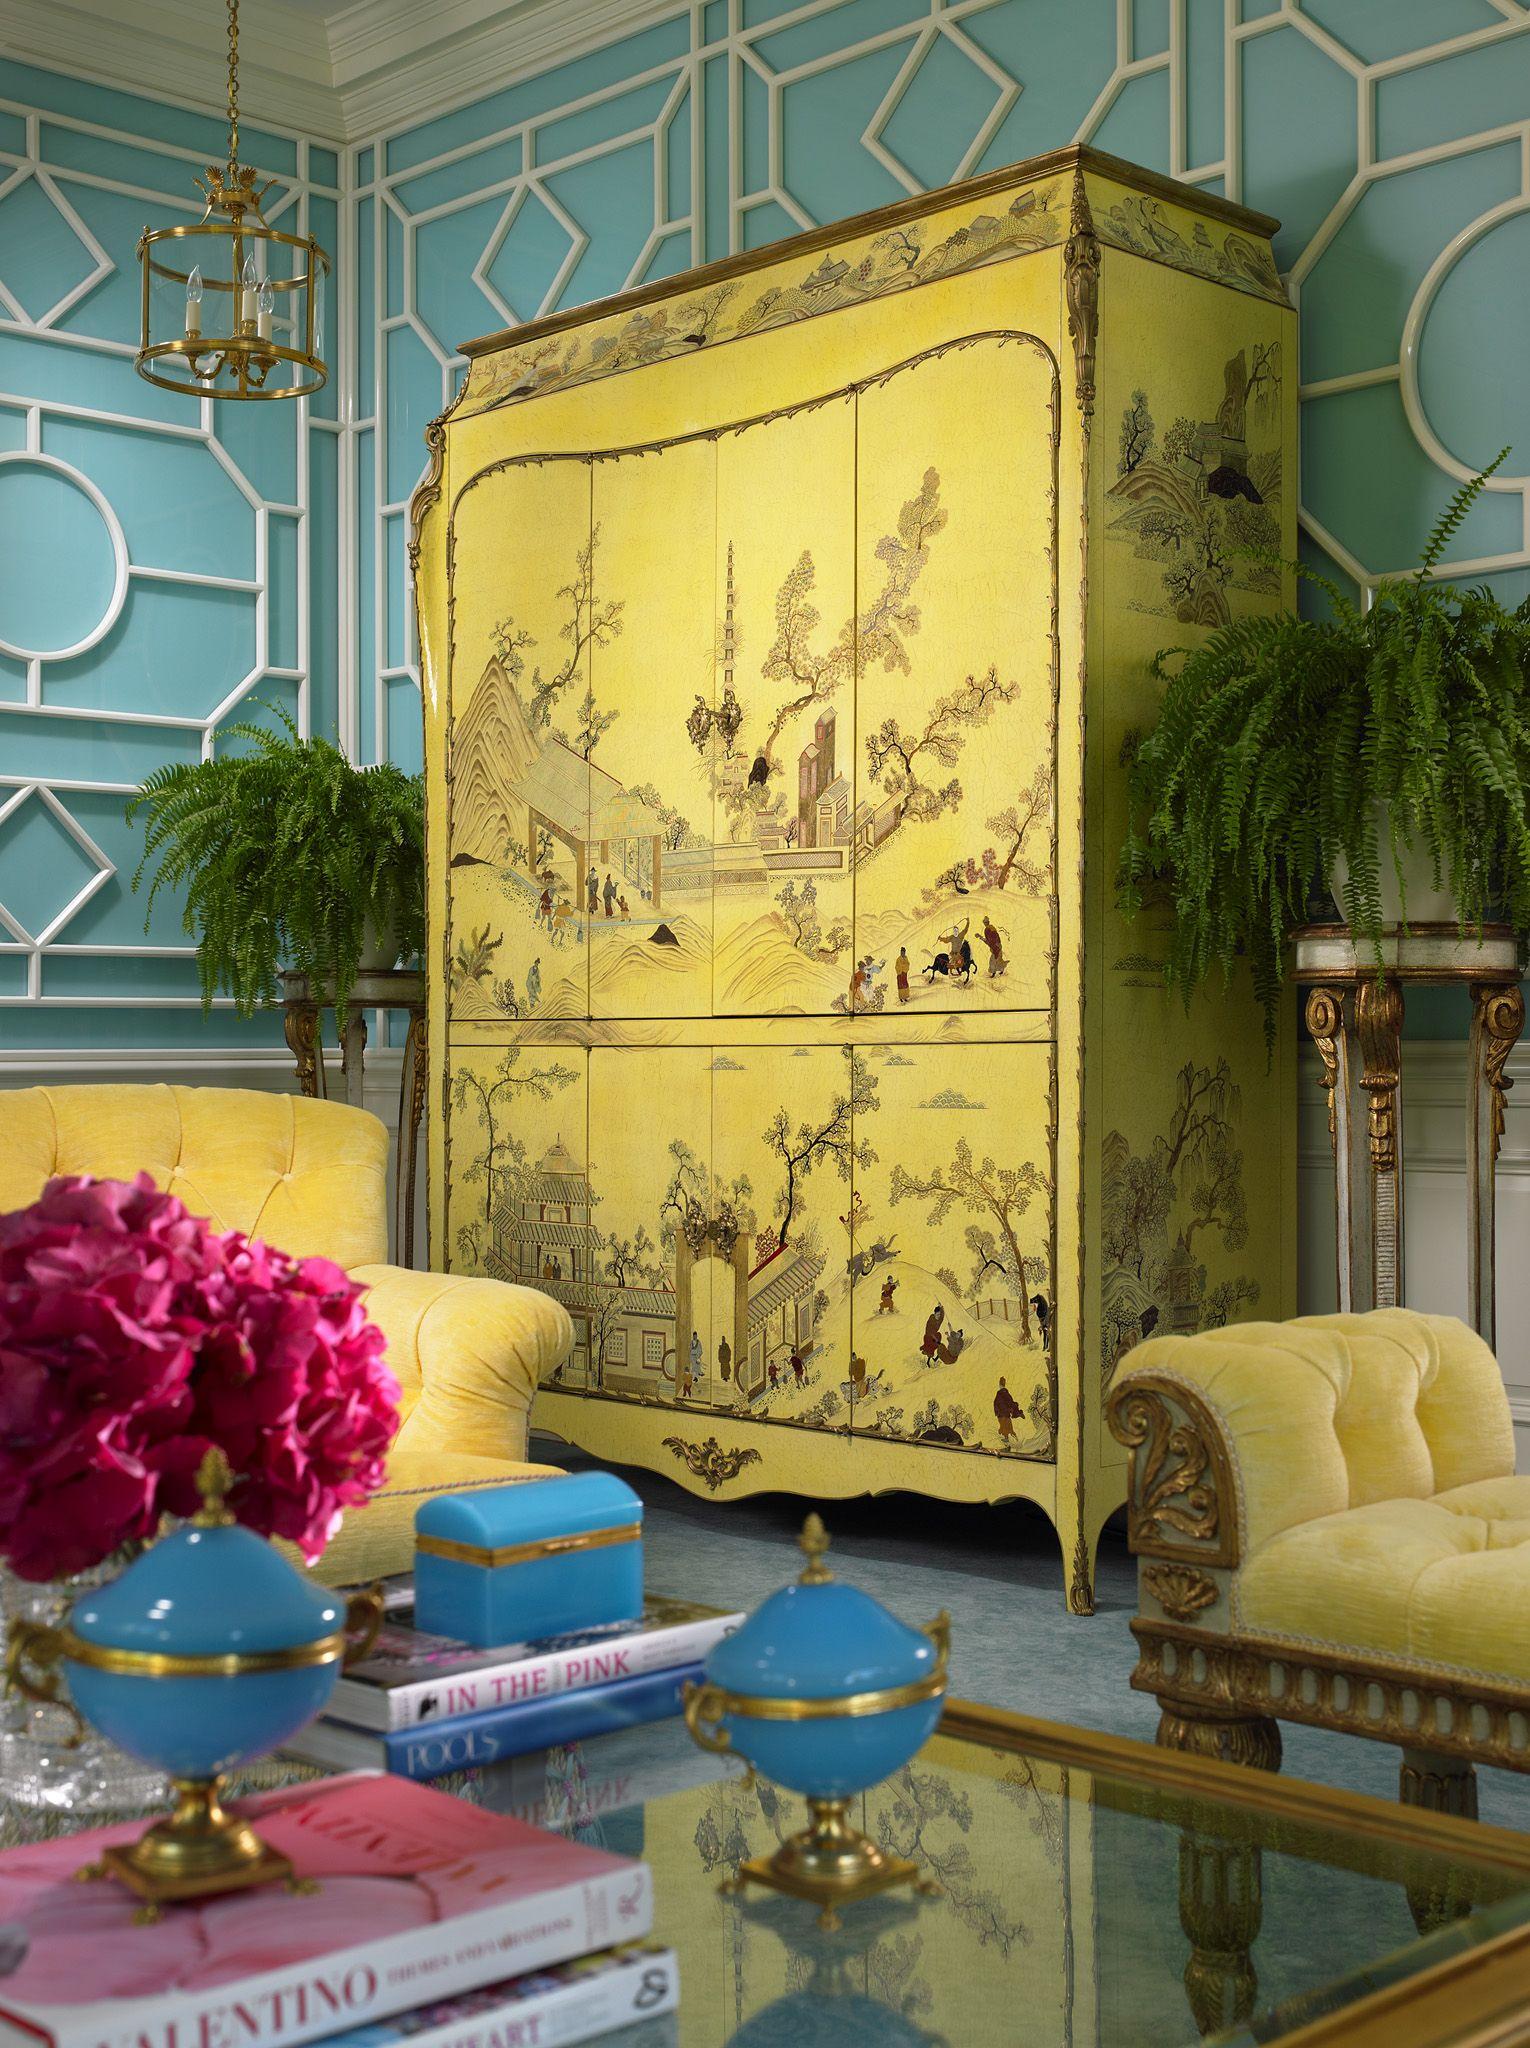 Fretwork molding on the turquoise walls...wonderful Yellow ...